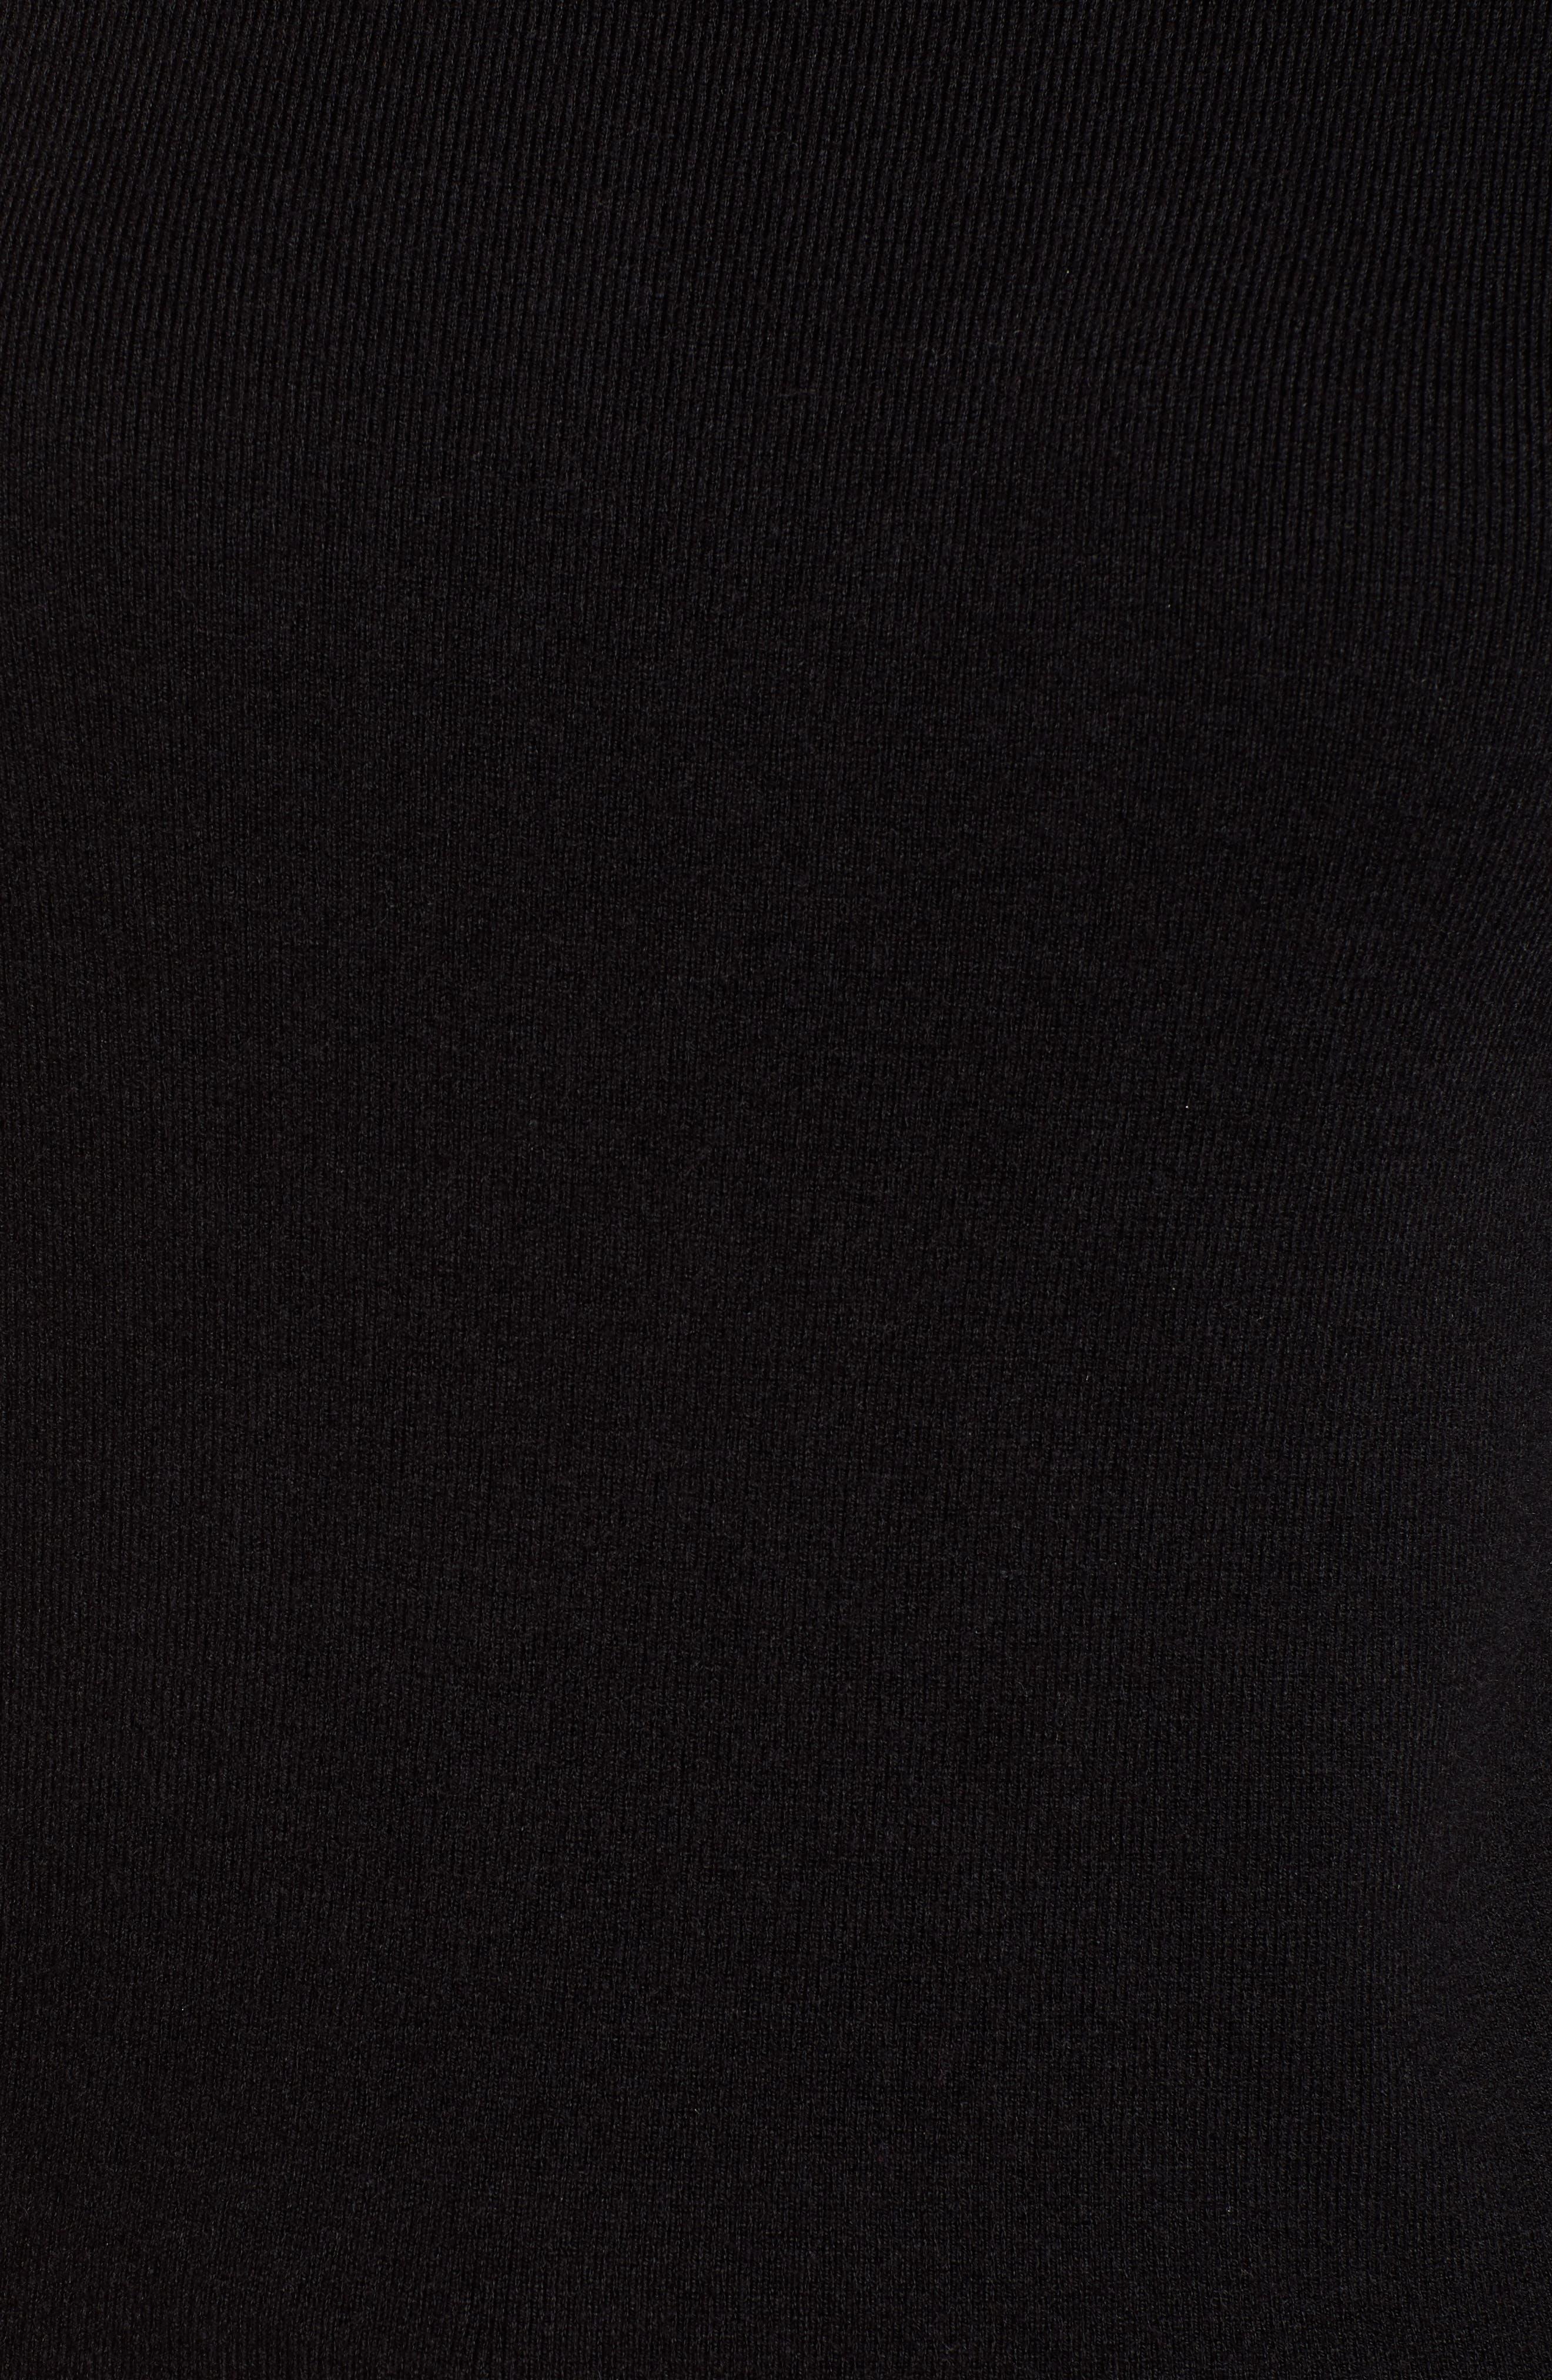 Halogen Scallop Edge Sweater,                             Alternate thumbnail 5, color,                             Black